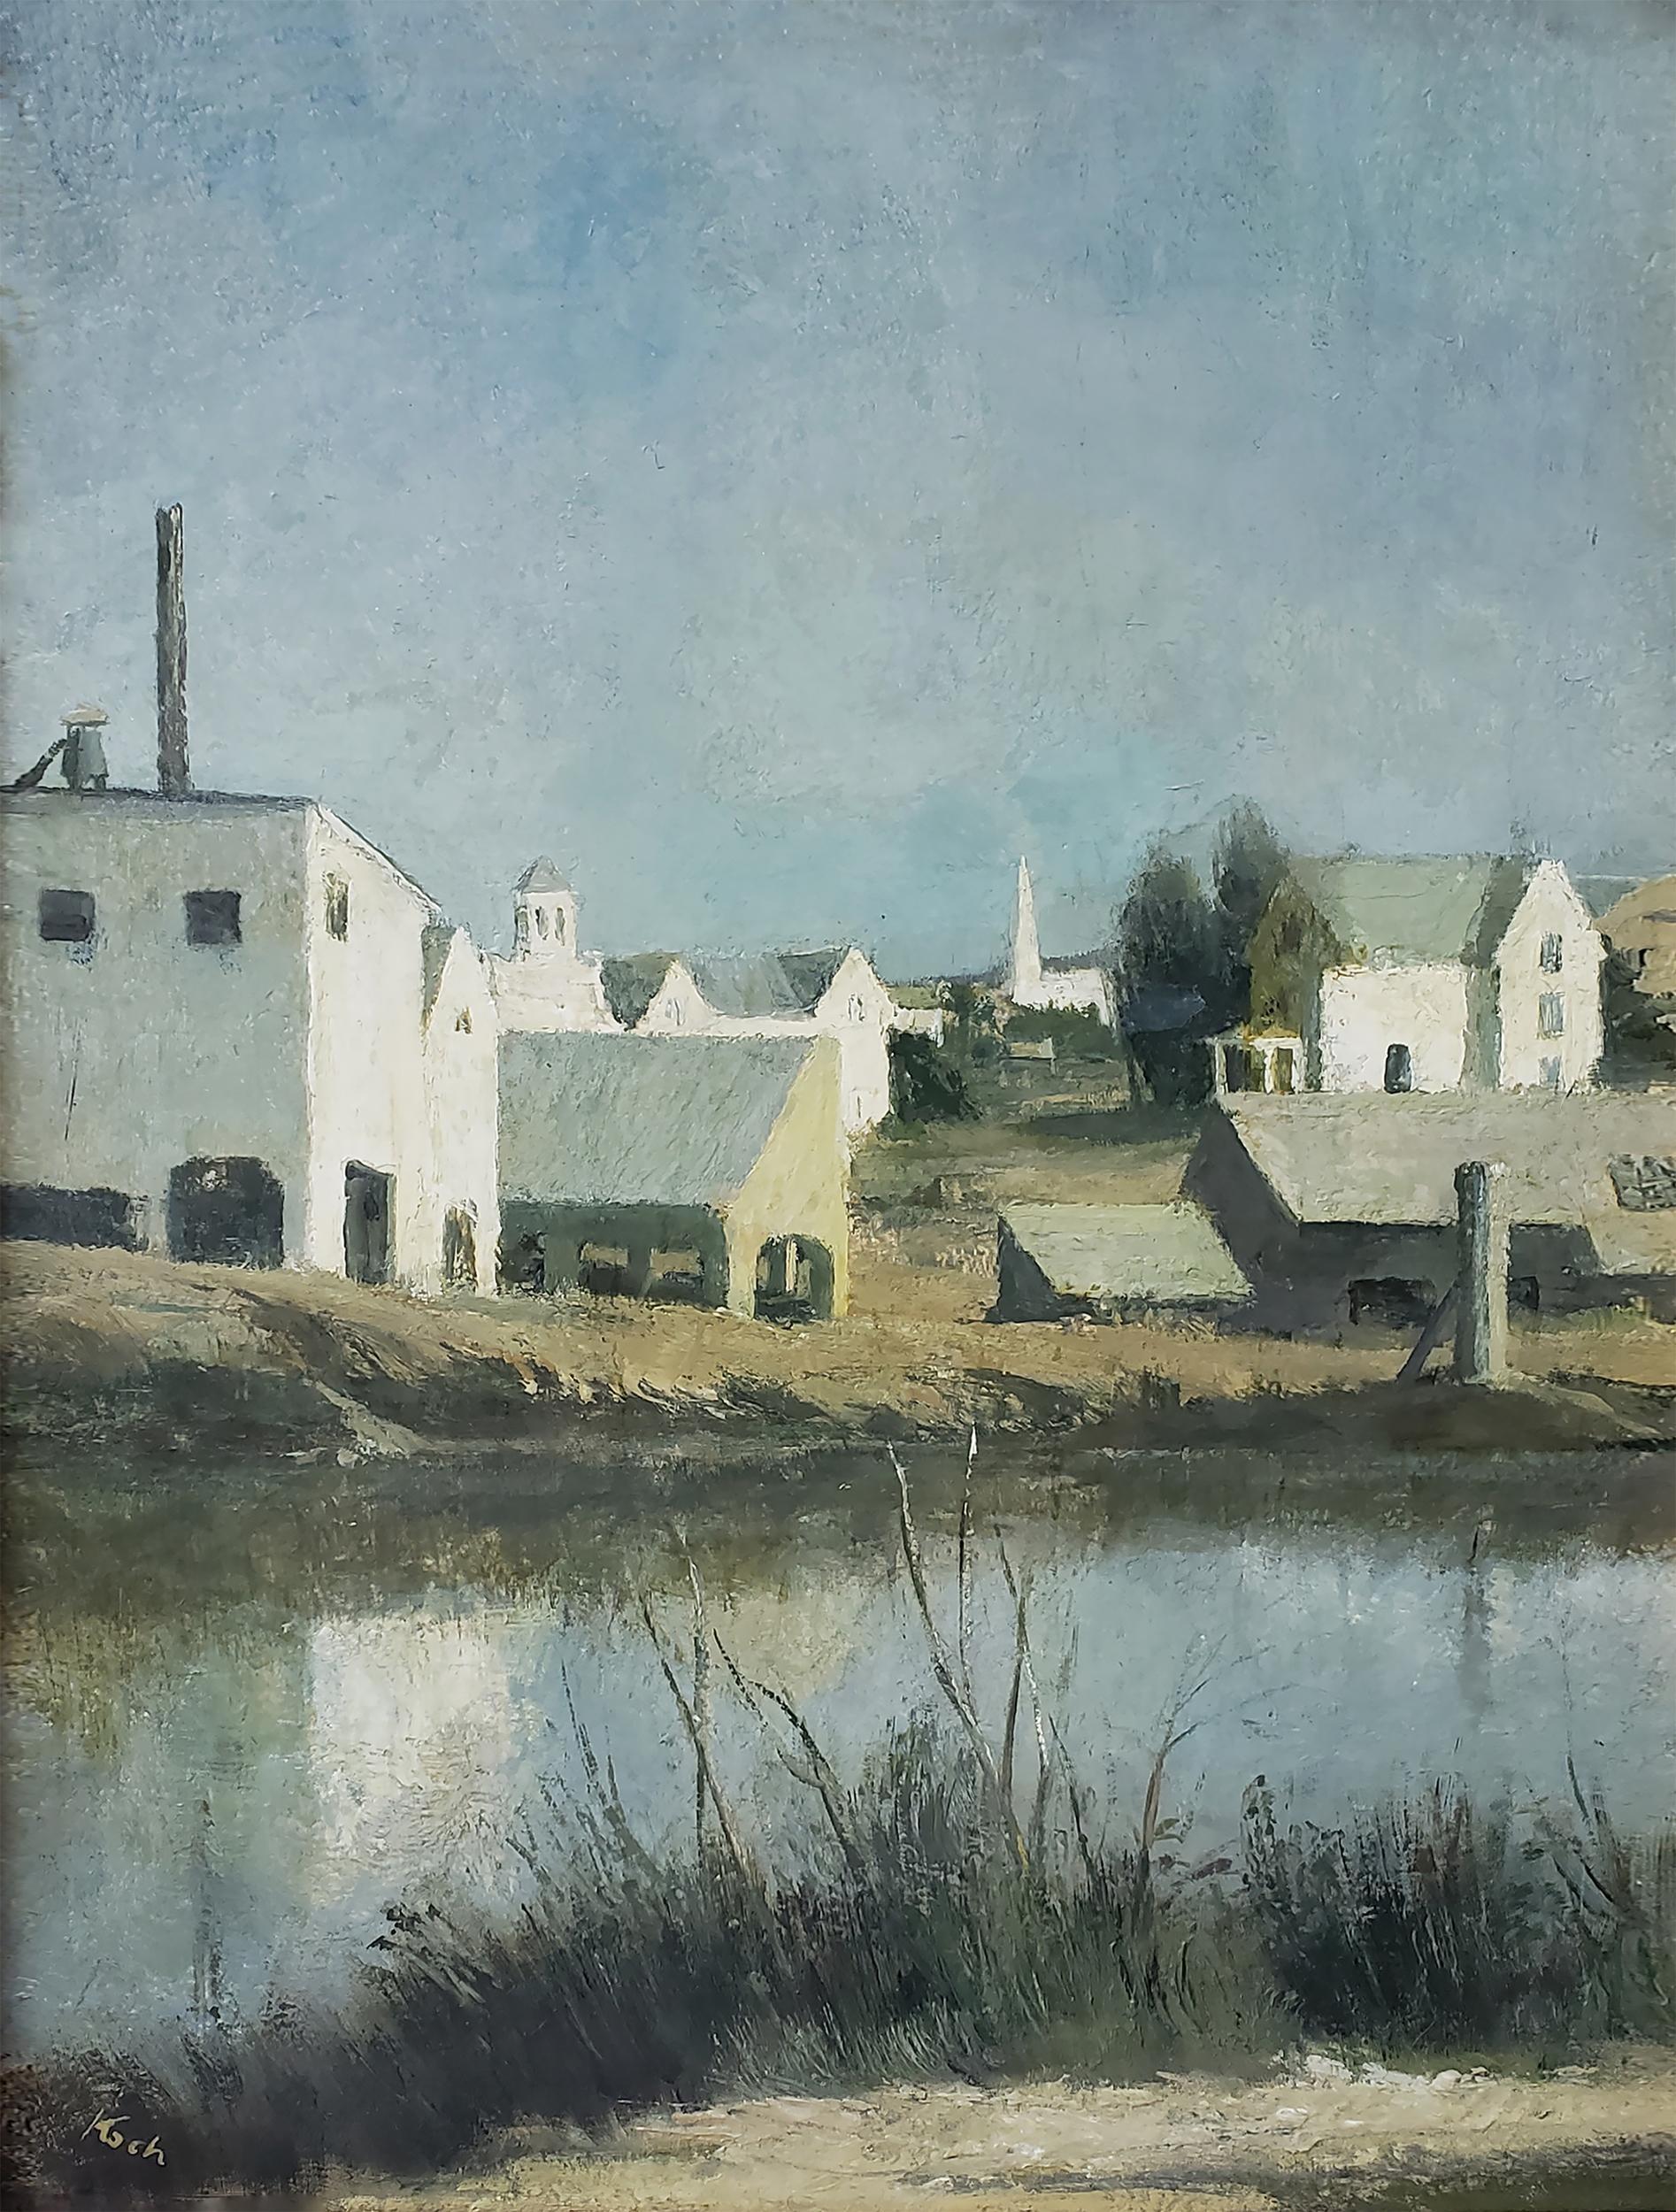 Vermont Barns - Neutral Monochromatic Study in Grays